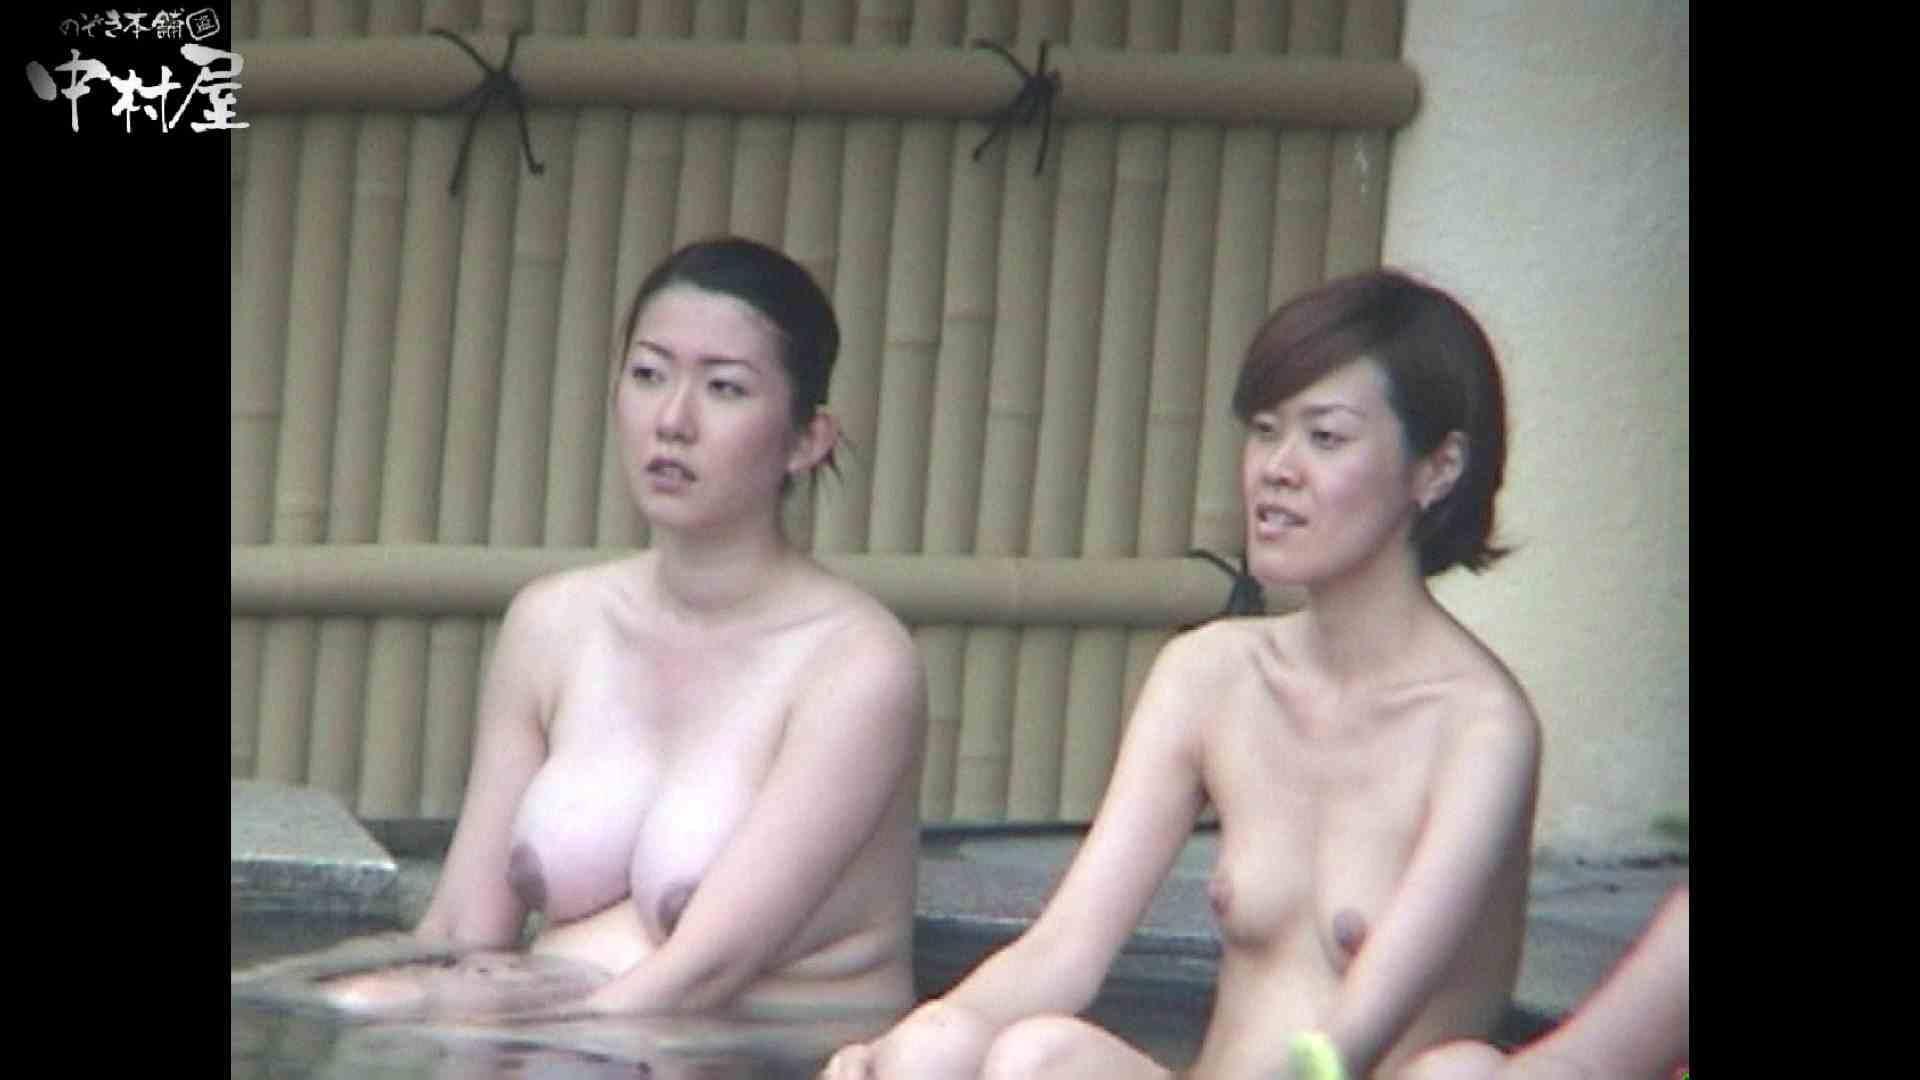 Aquaな露天風呂Vol.961 盗撮 のぞき動画画像 61枚 17